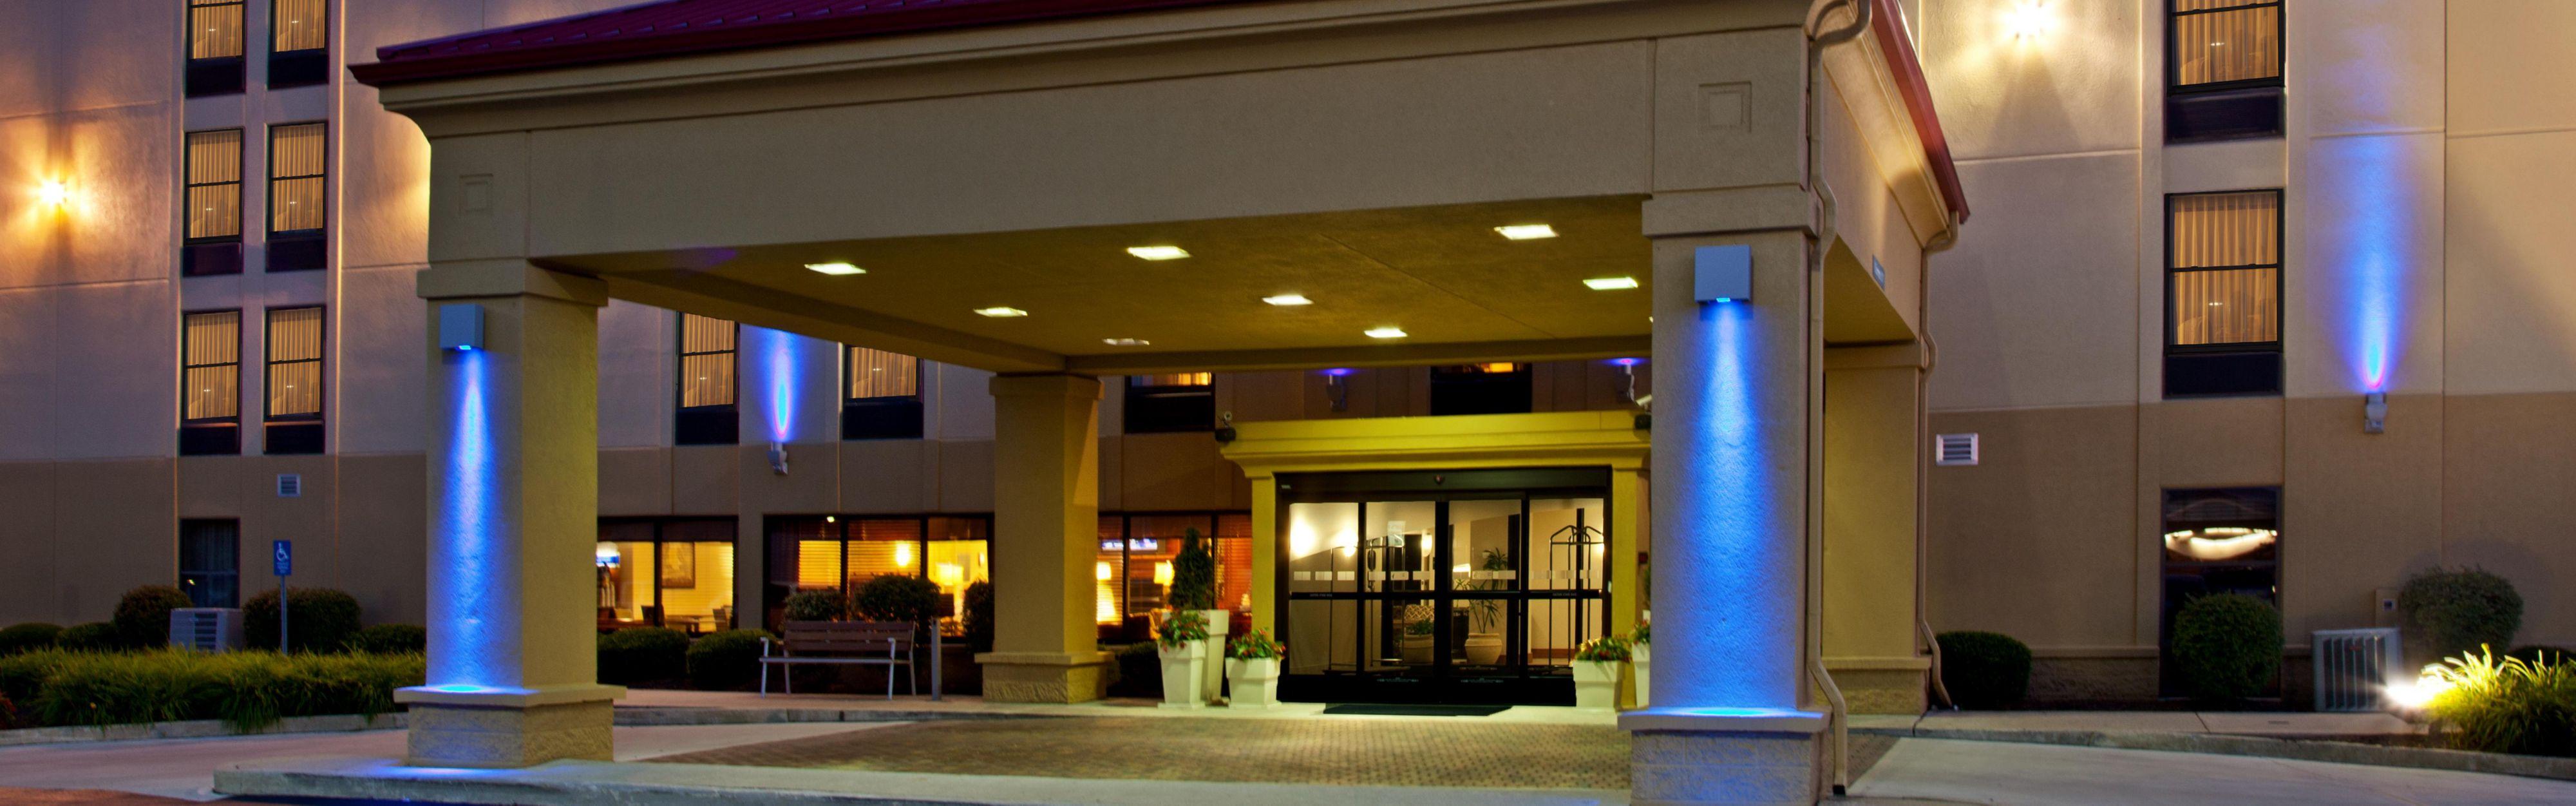 Holiday Inn Express Indianapolis South image 0